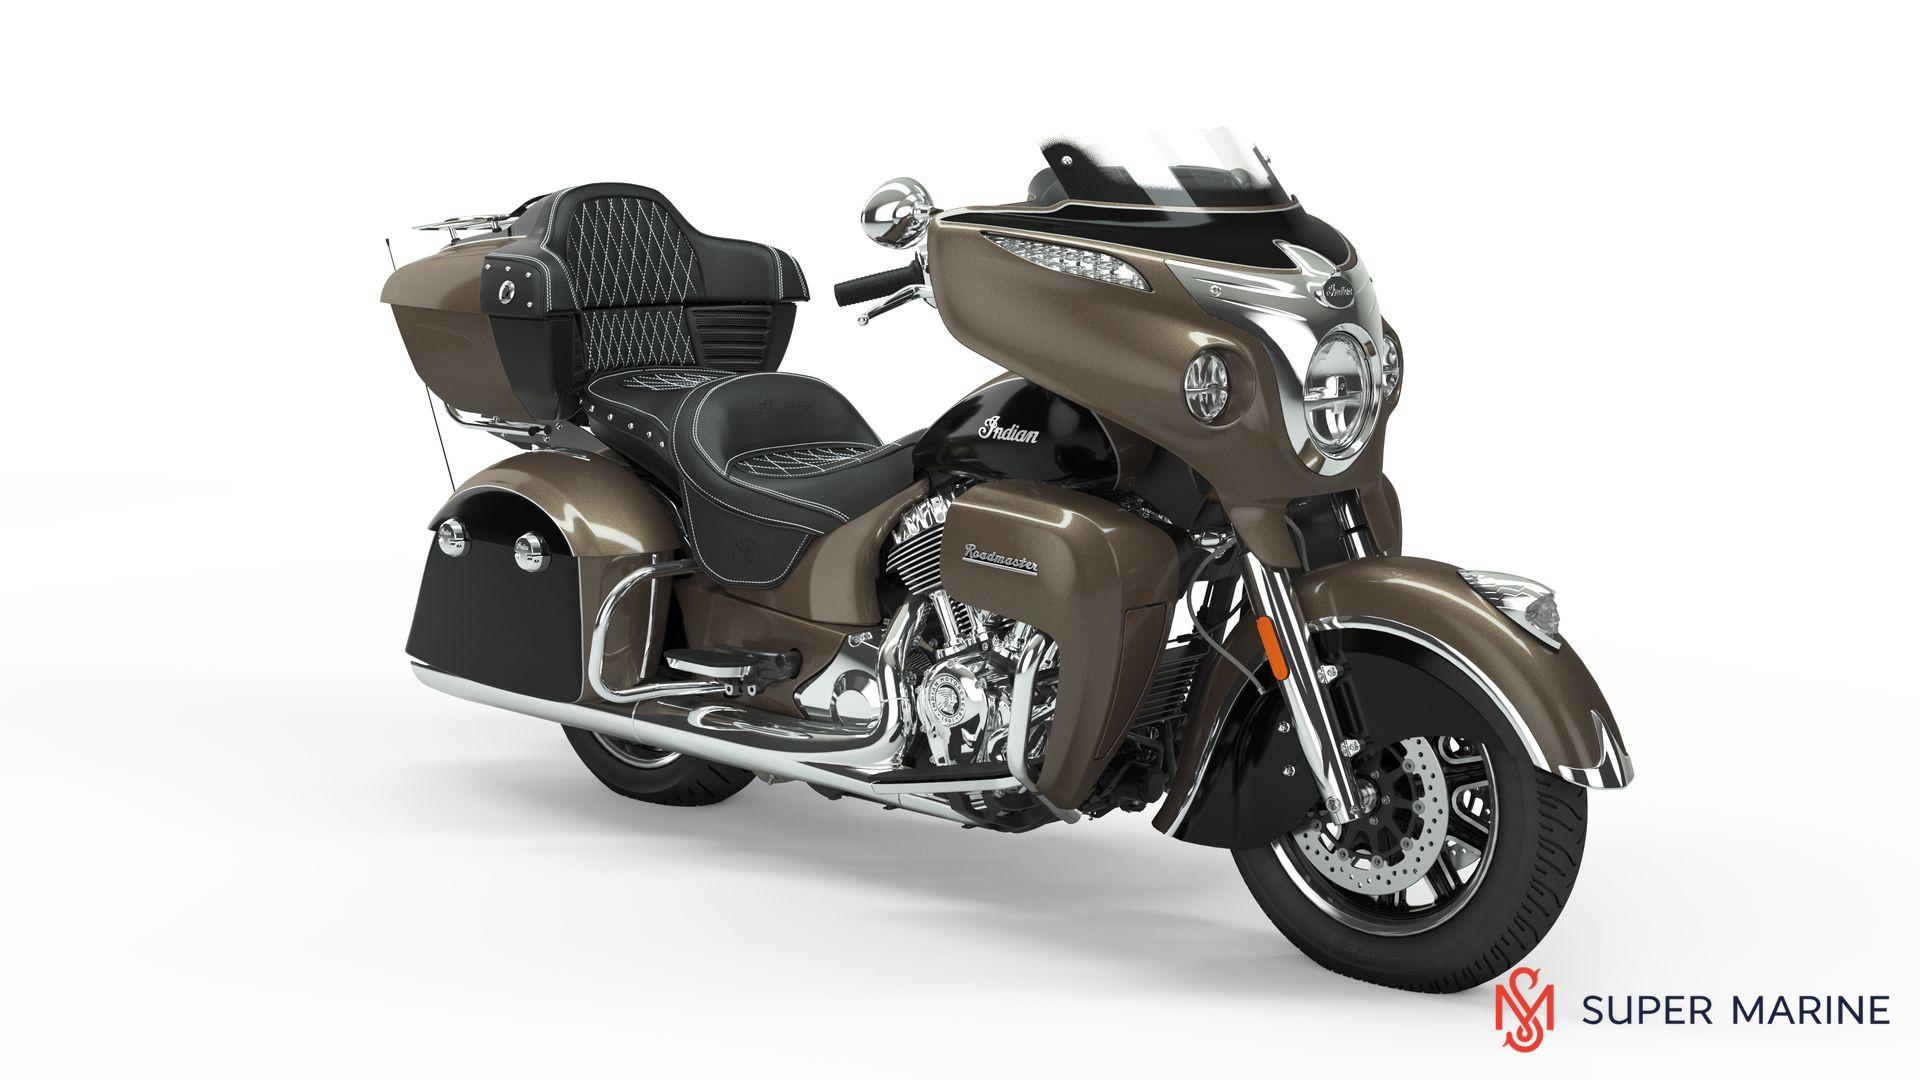 Мотоцикл Indian Roadmaster Polished Bronze / Thunder Black 2019 - 1